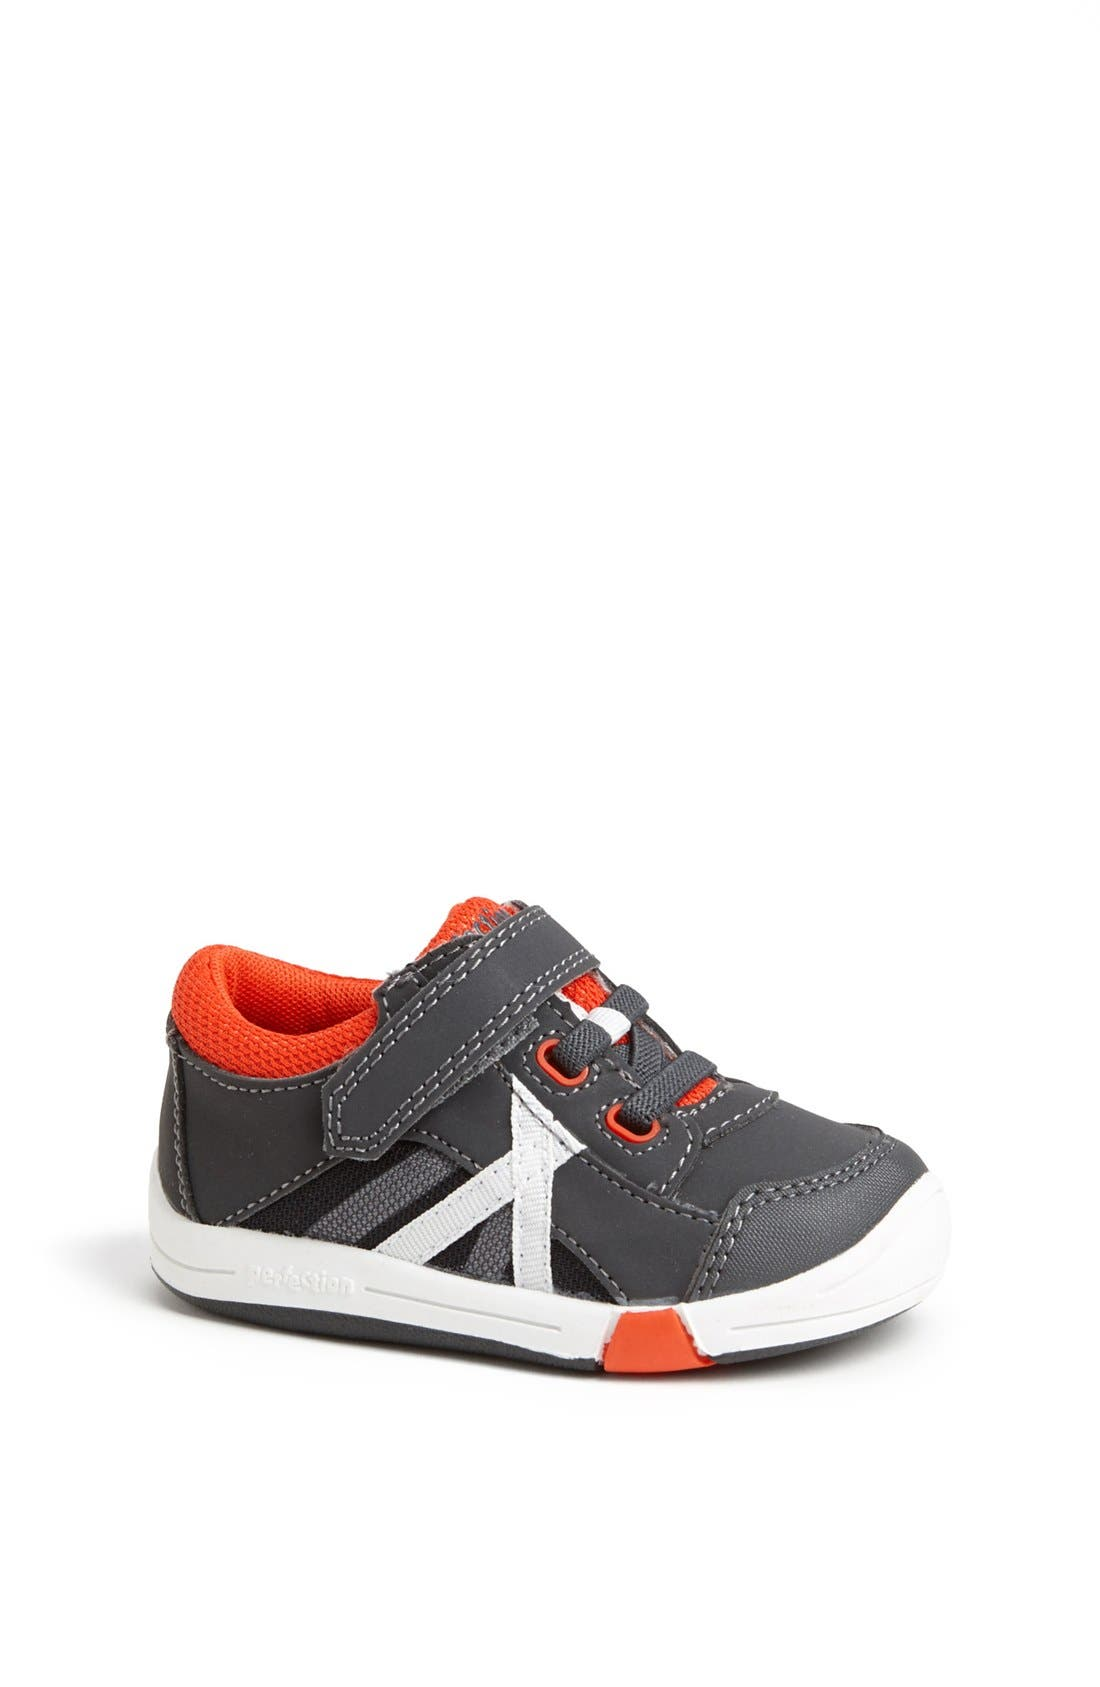 Main Image - Jumping Jacks 'Finish Line' Sneaker (Baby, Walker & Toddler)